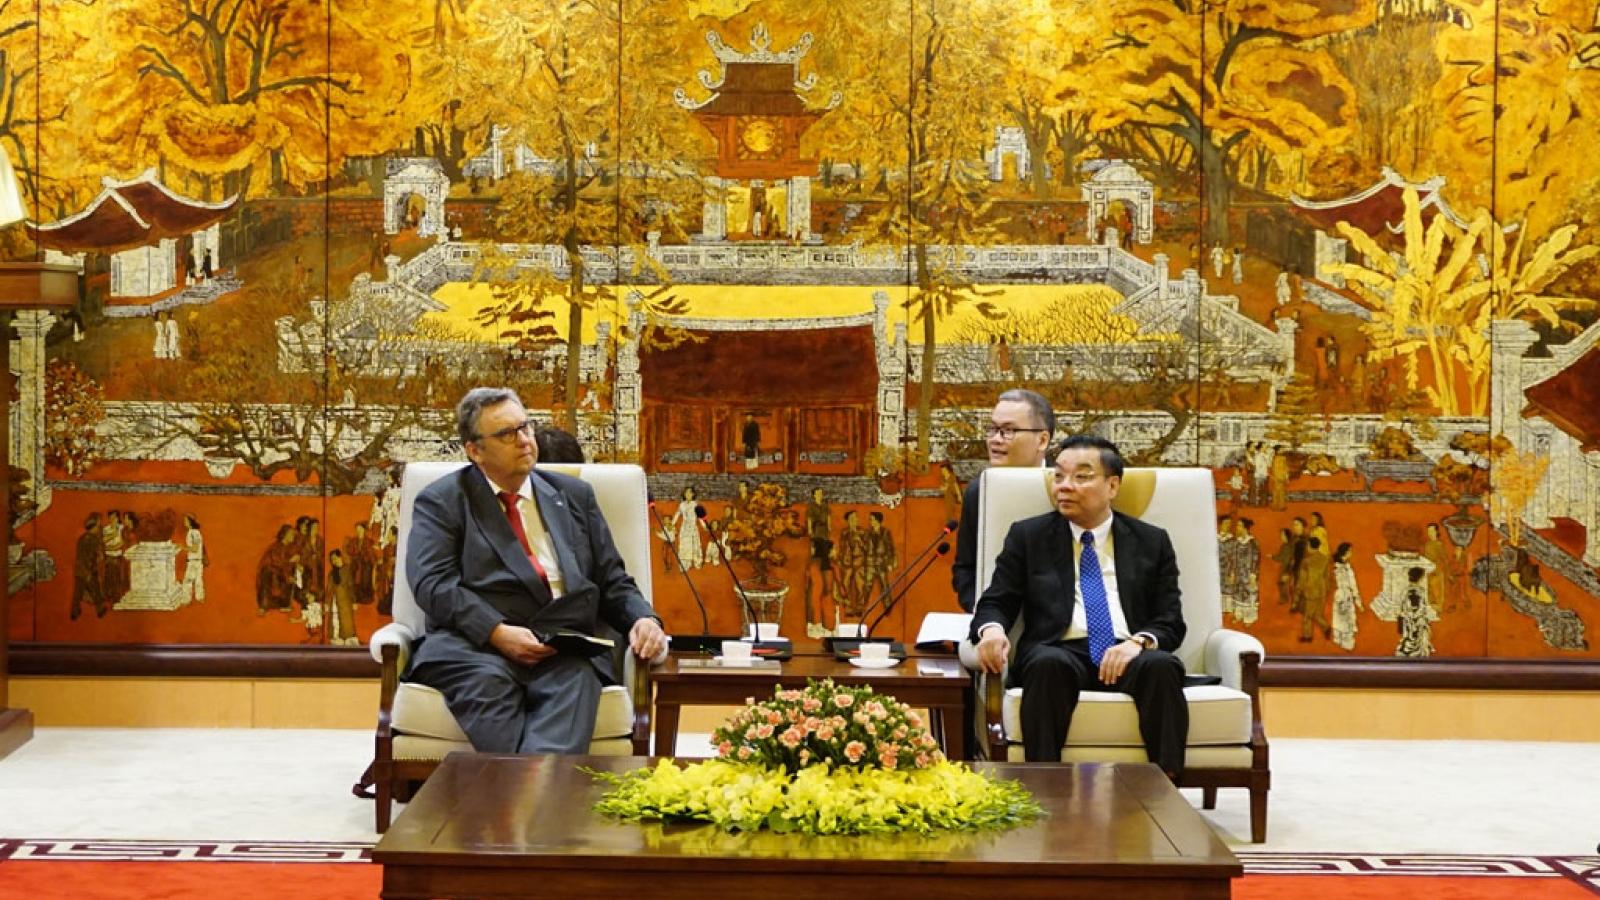 Hanoi welcomes Finnish investors, says city leader